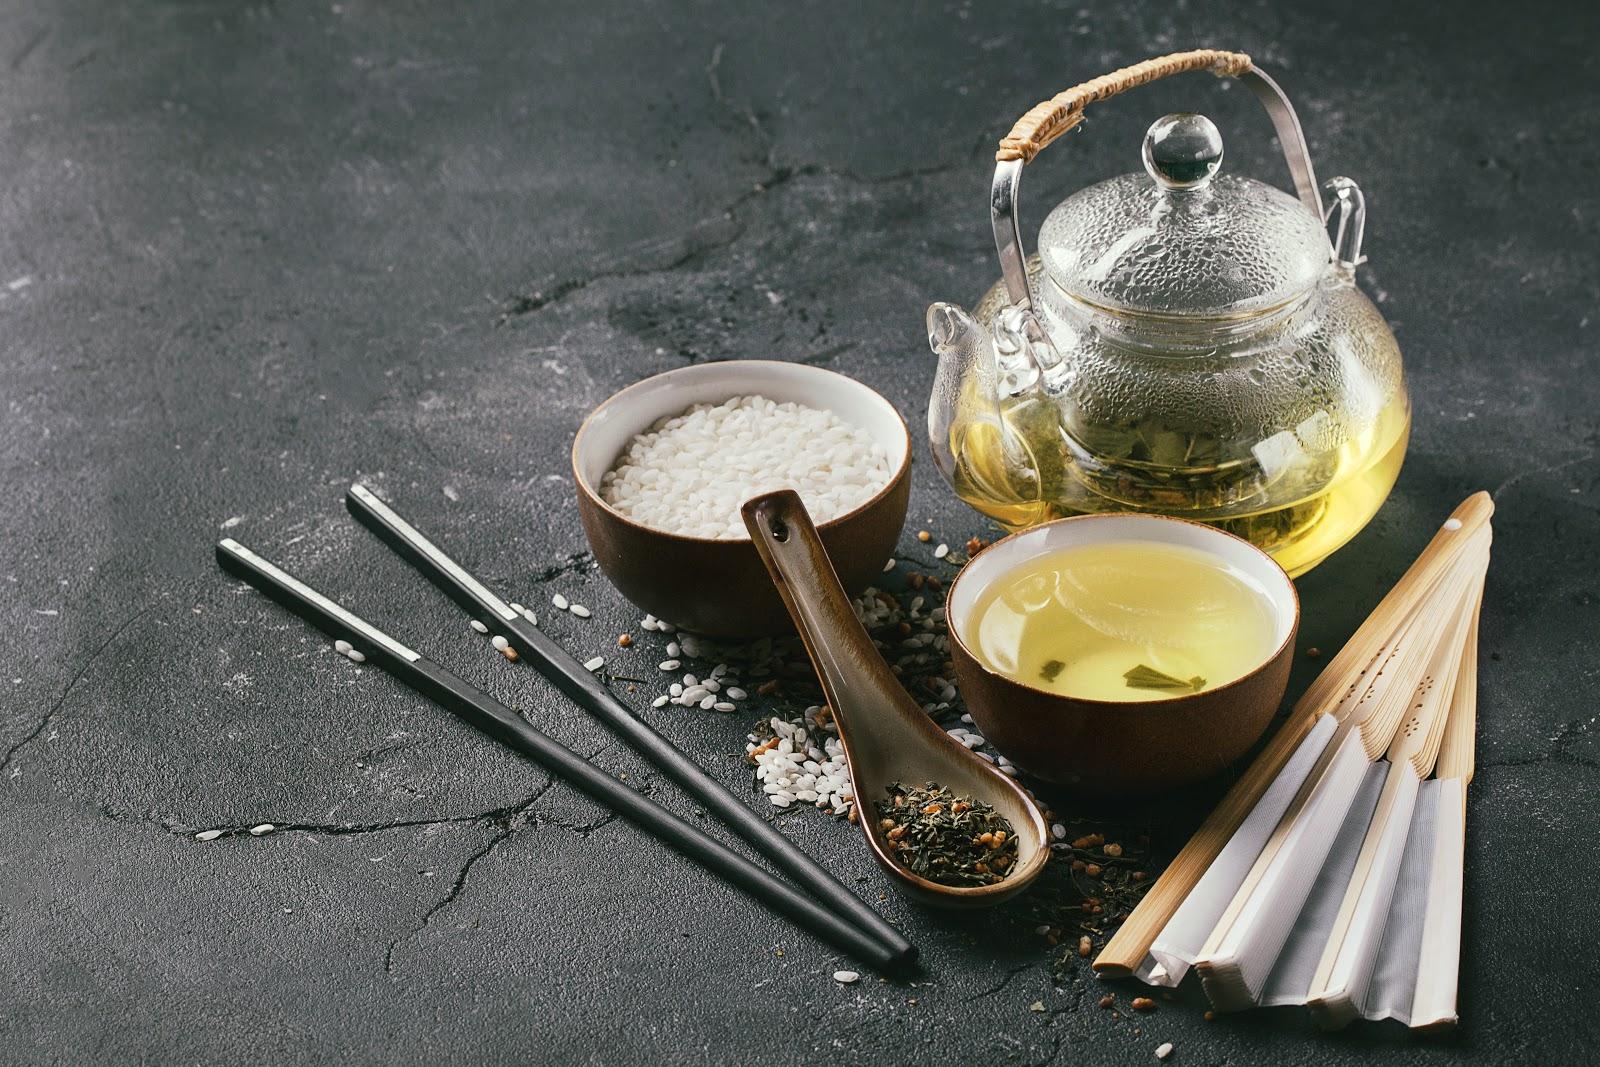 genmaicha tea with white rice